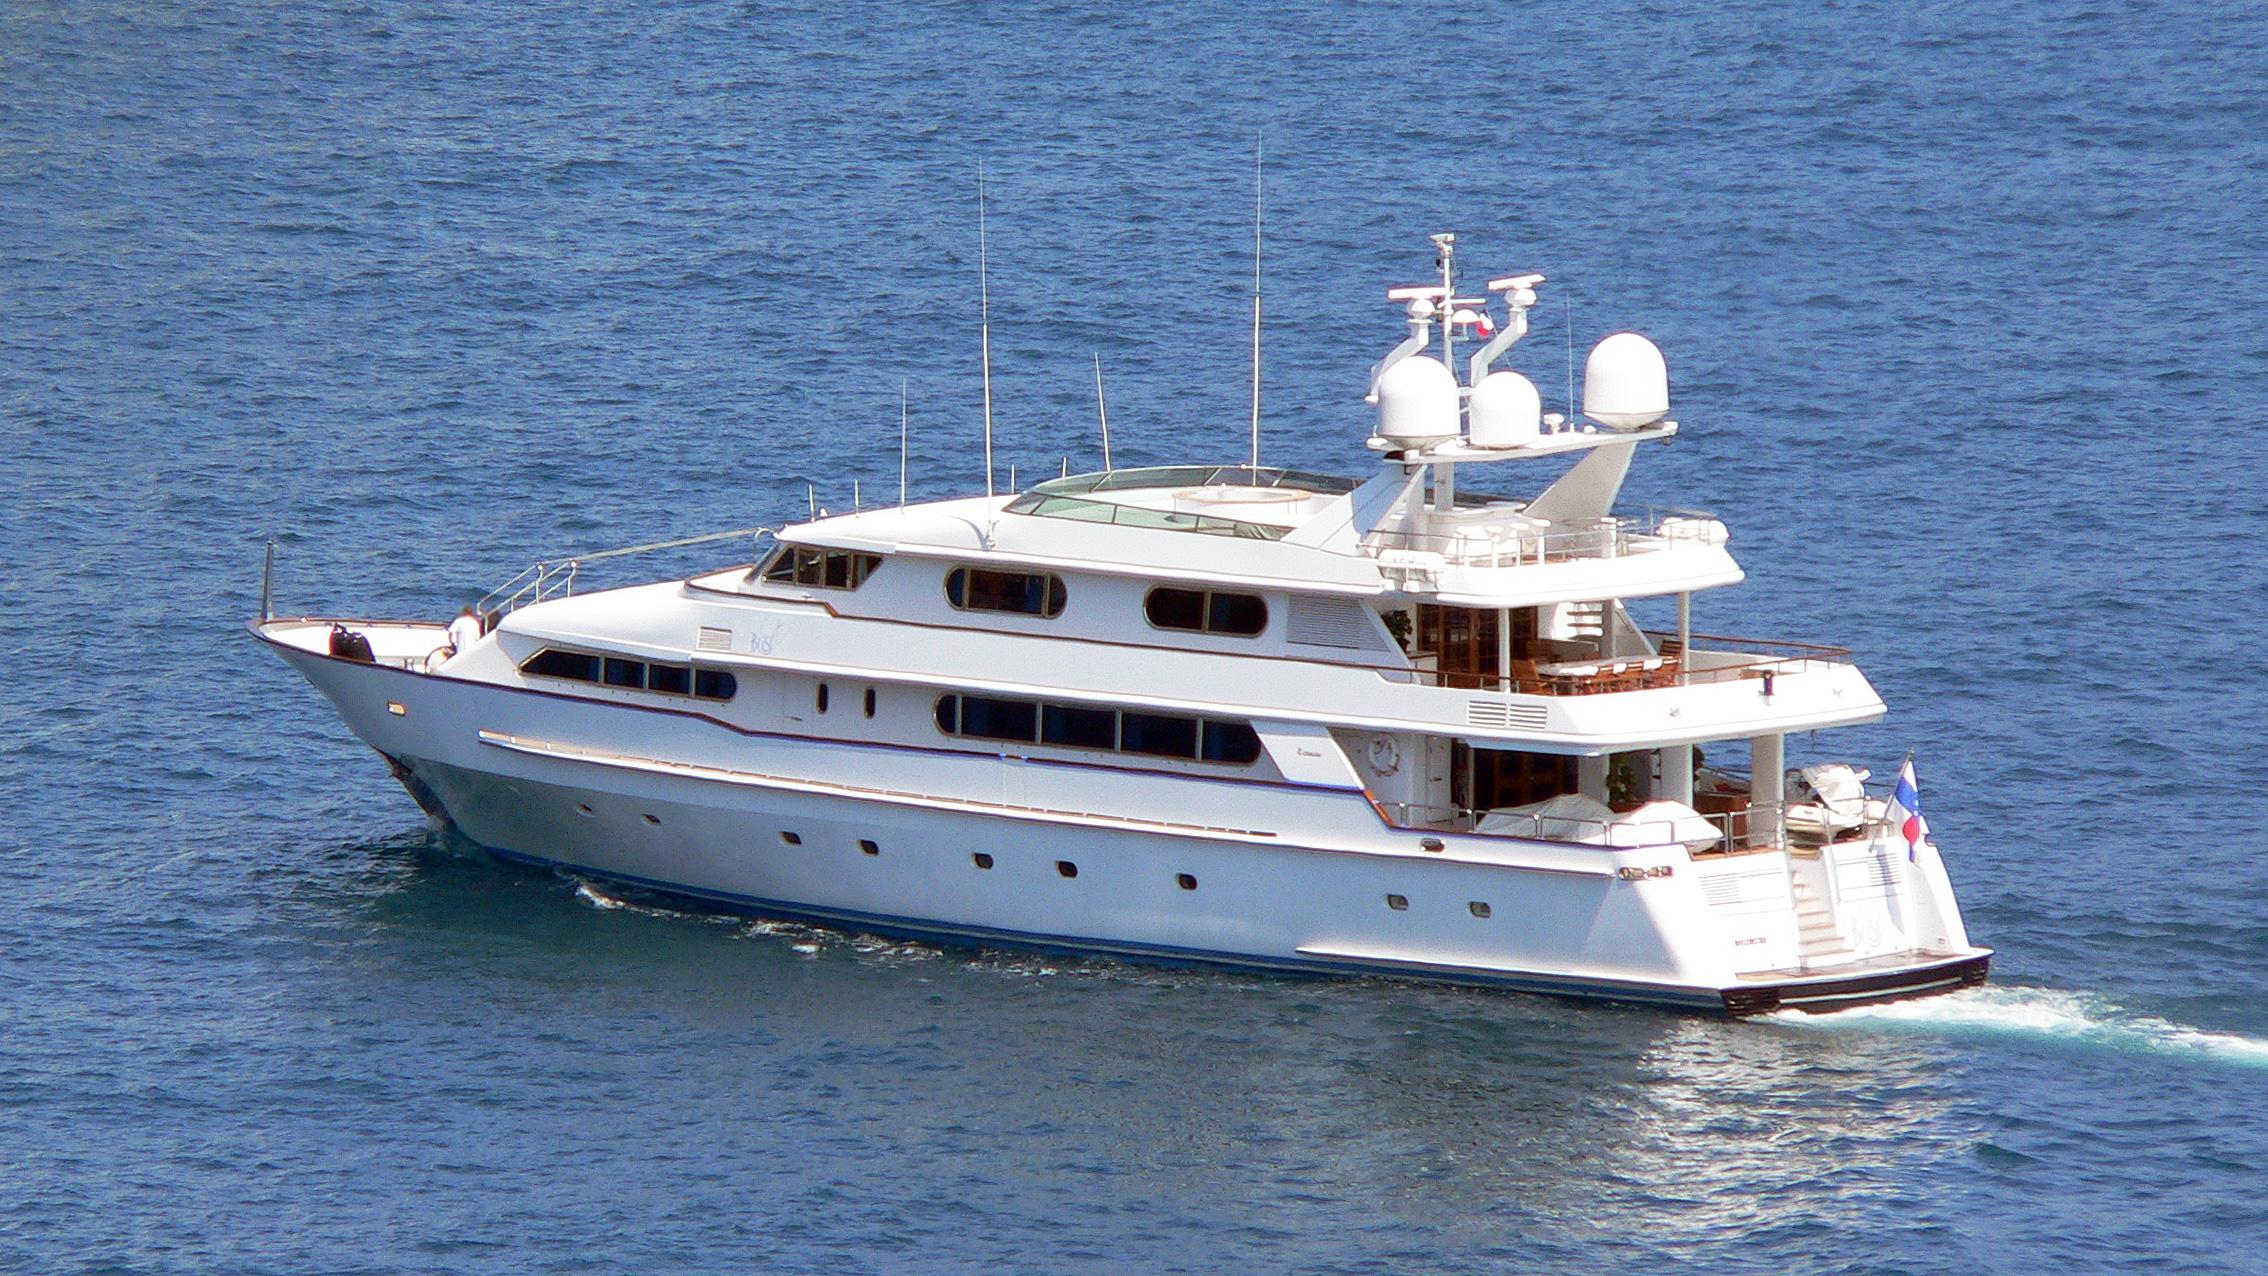 xana-ouranos-too-motor-yacht-codecasa-1994-40m-cruising-stern